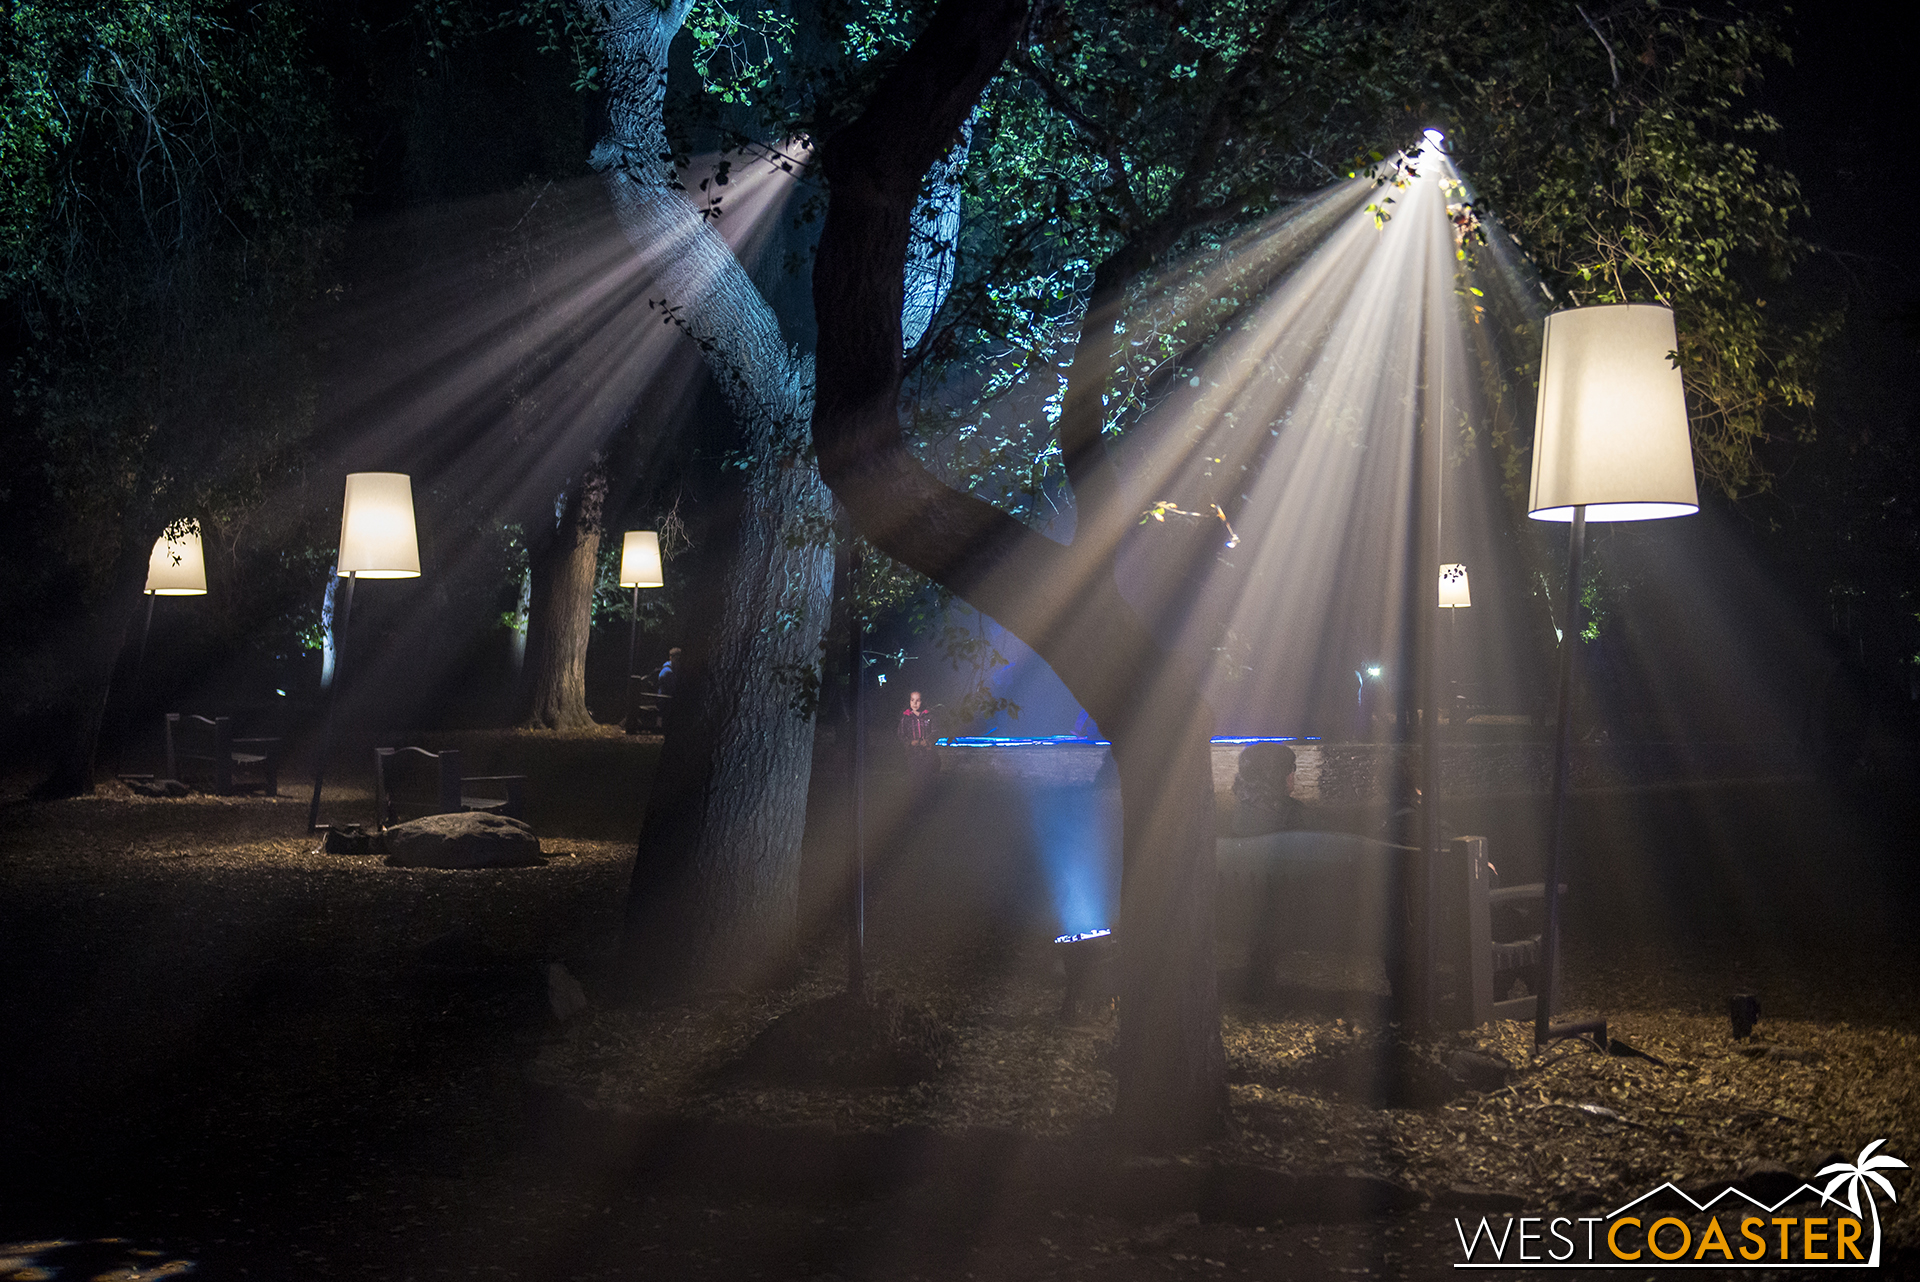 Descanso-17_1201-07-LuminousLawn-0010.jpg